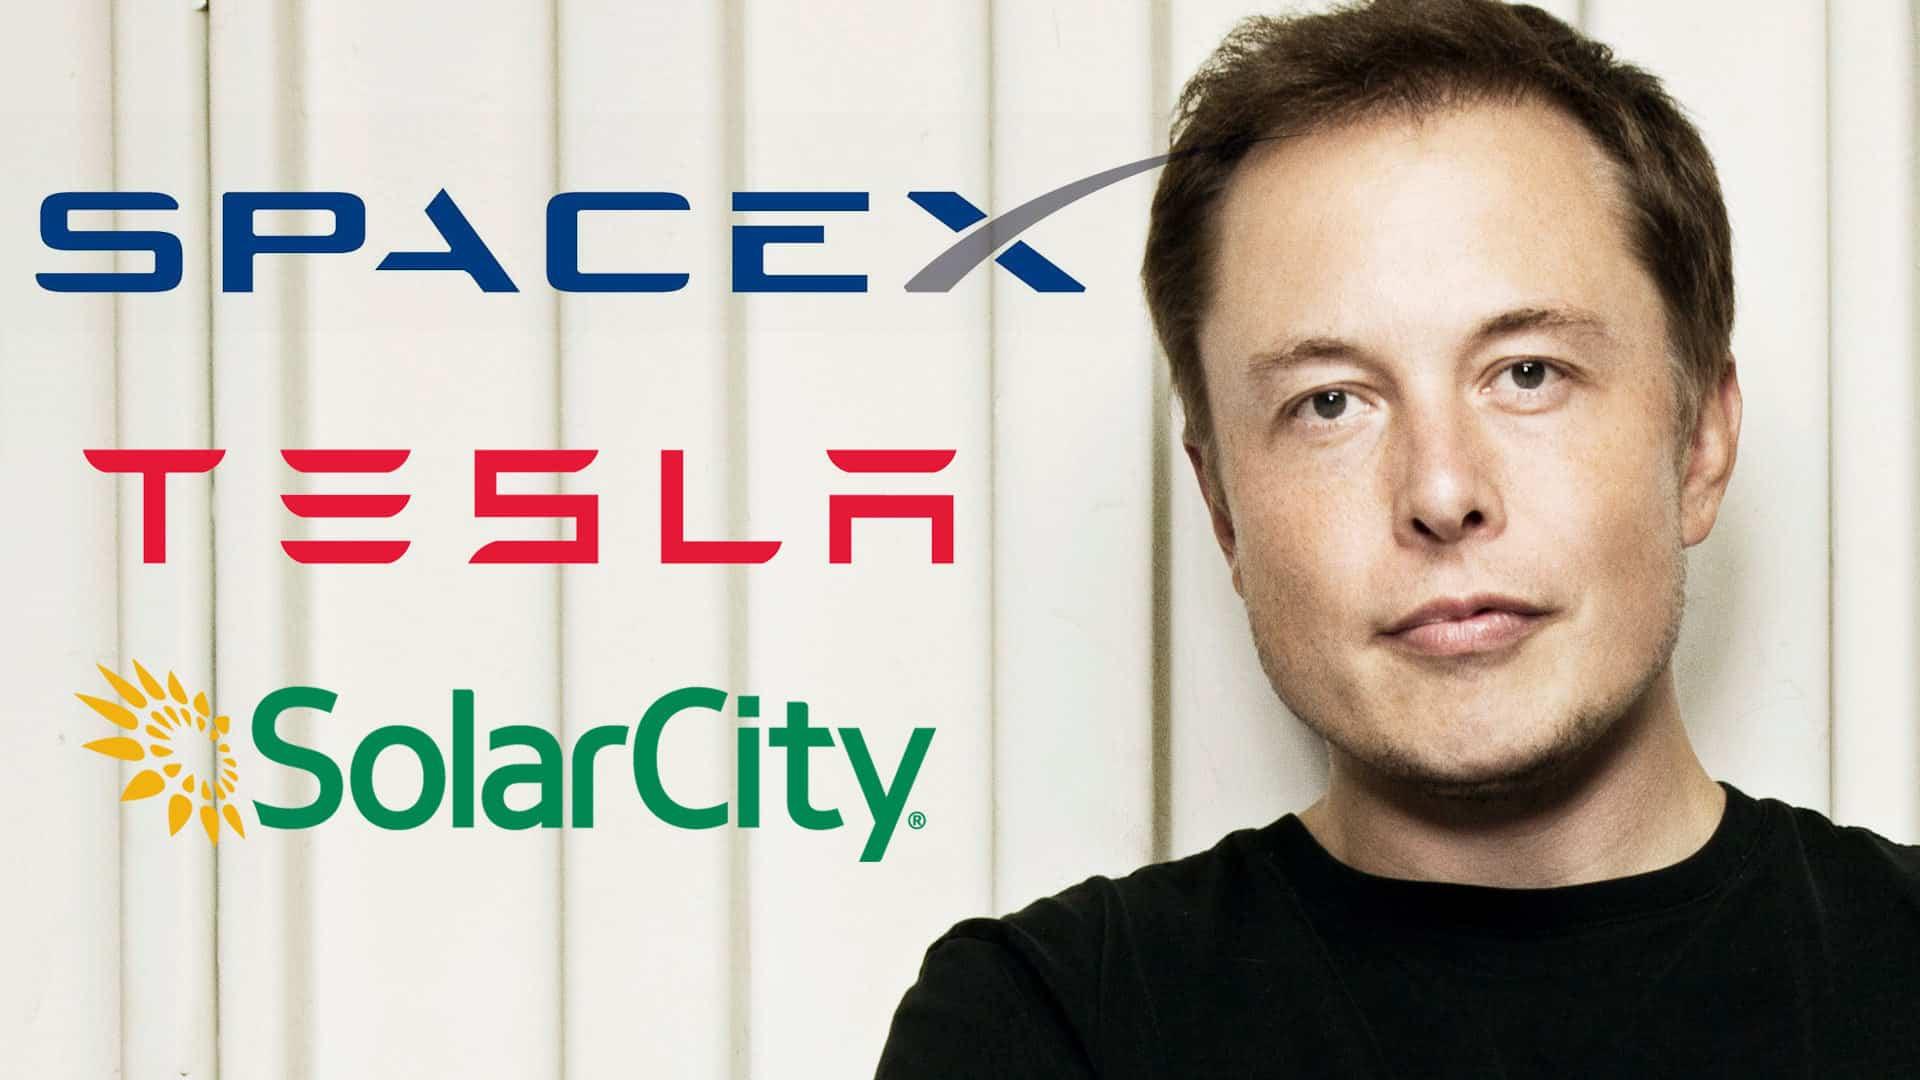 Elon Musk Tesla SpaceX SolarCity